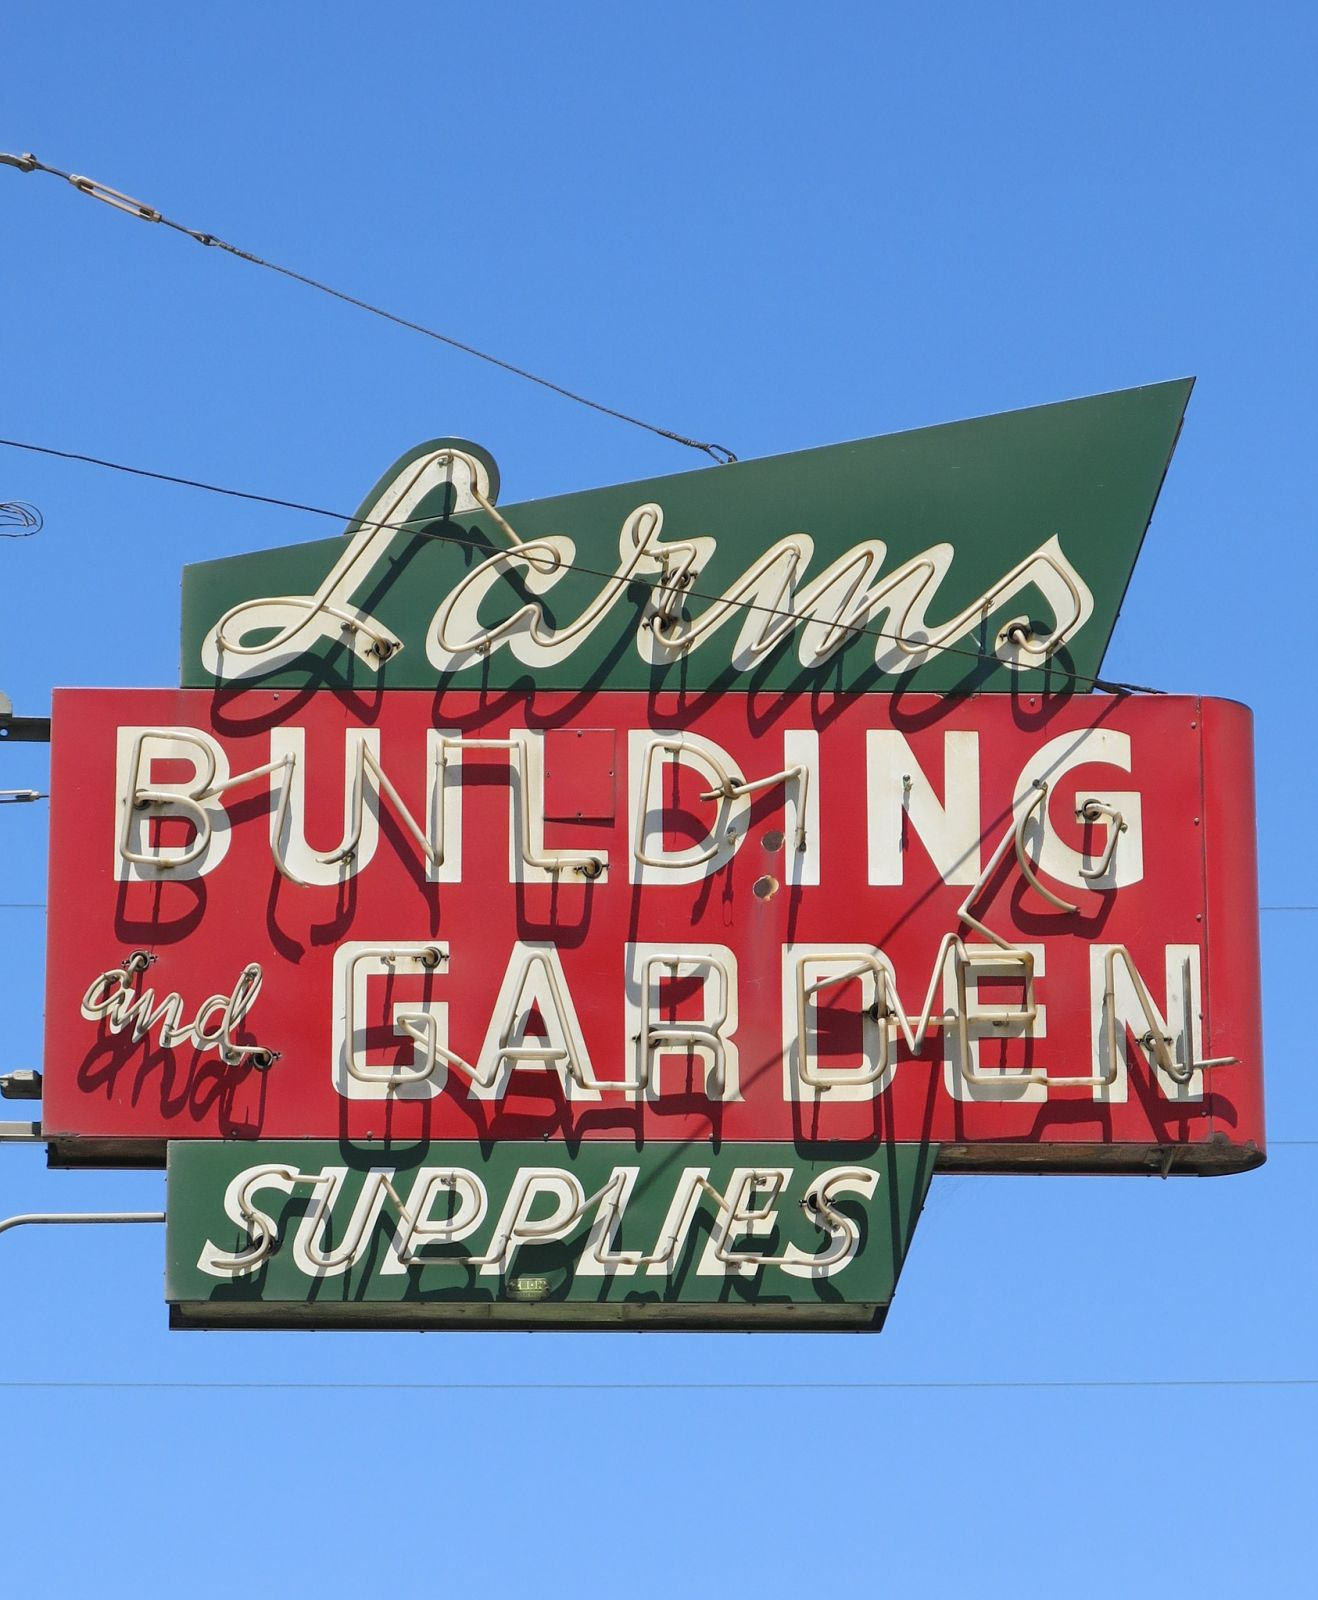 Larm's Building and Garden Supplies - Oakland, Calif.